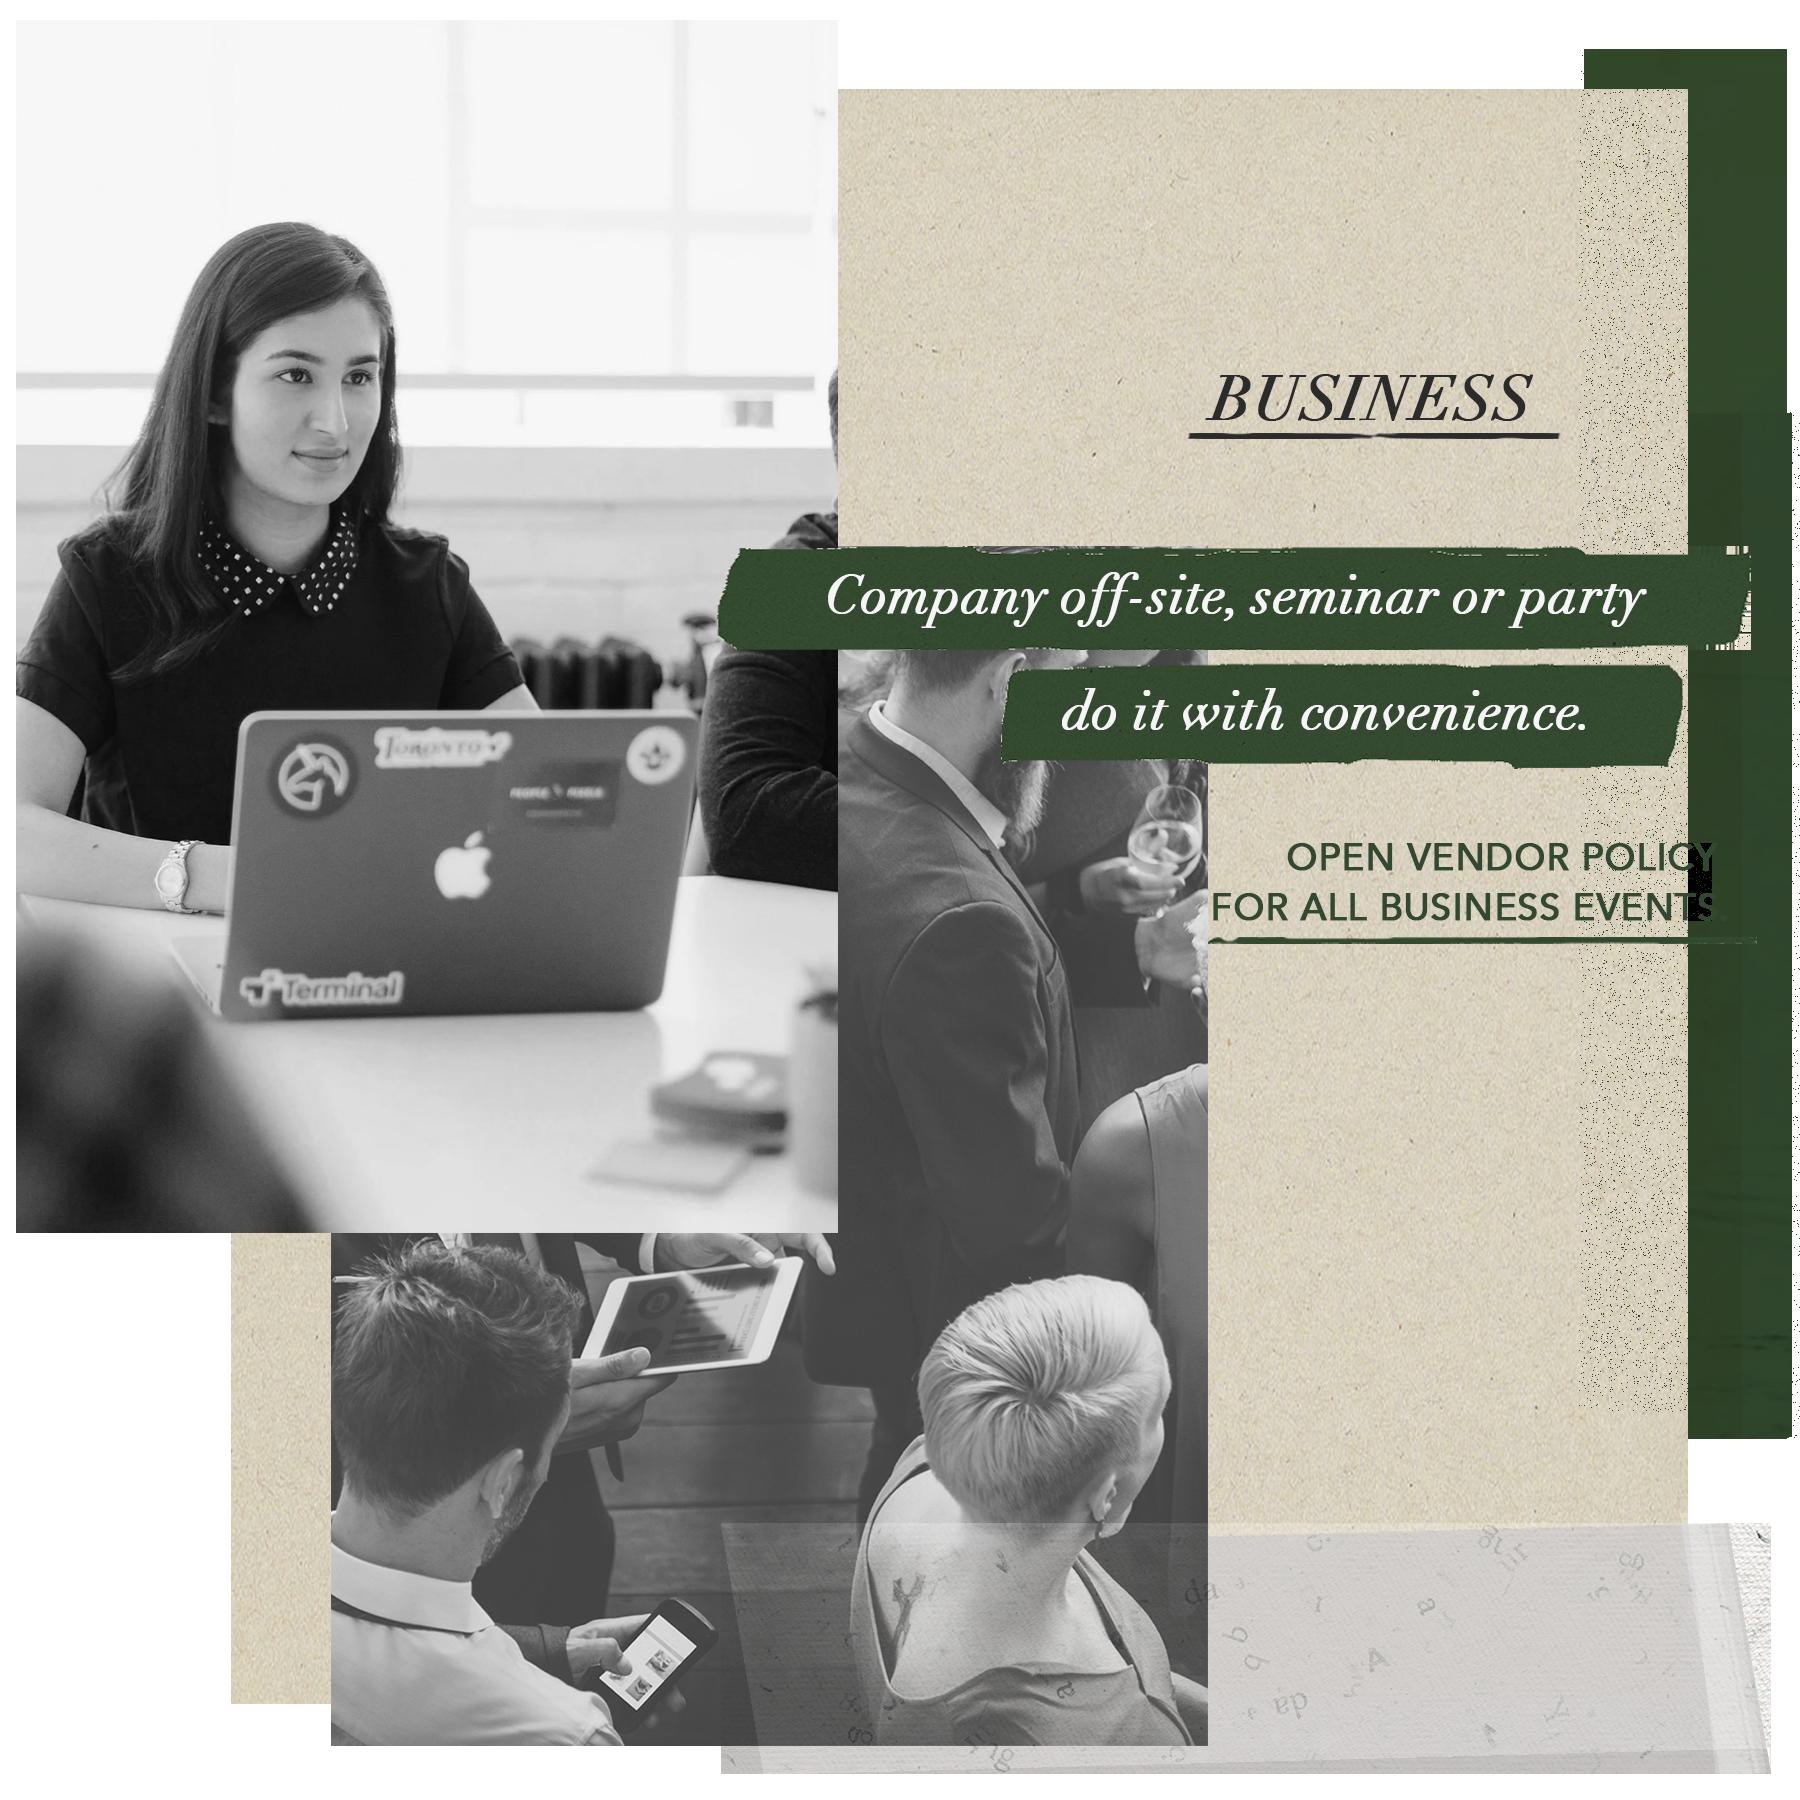 BVV_WebBLock_Business.png